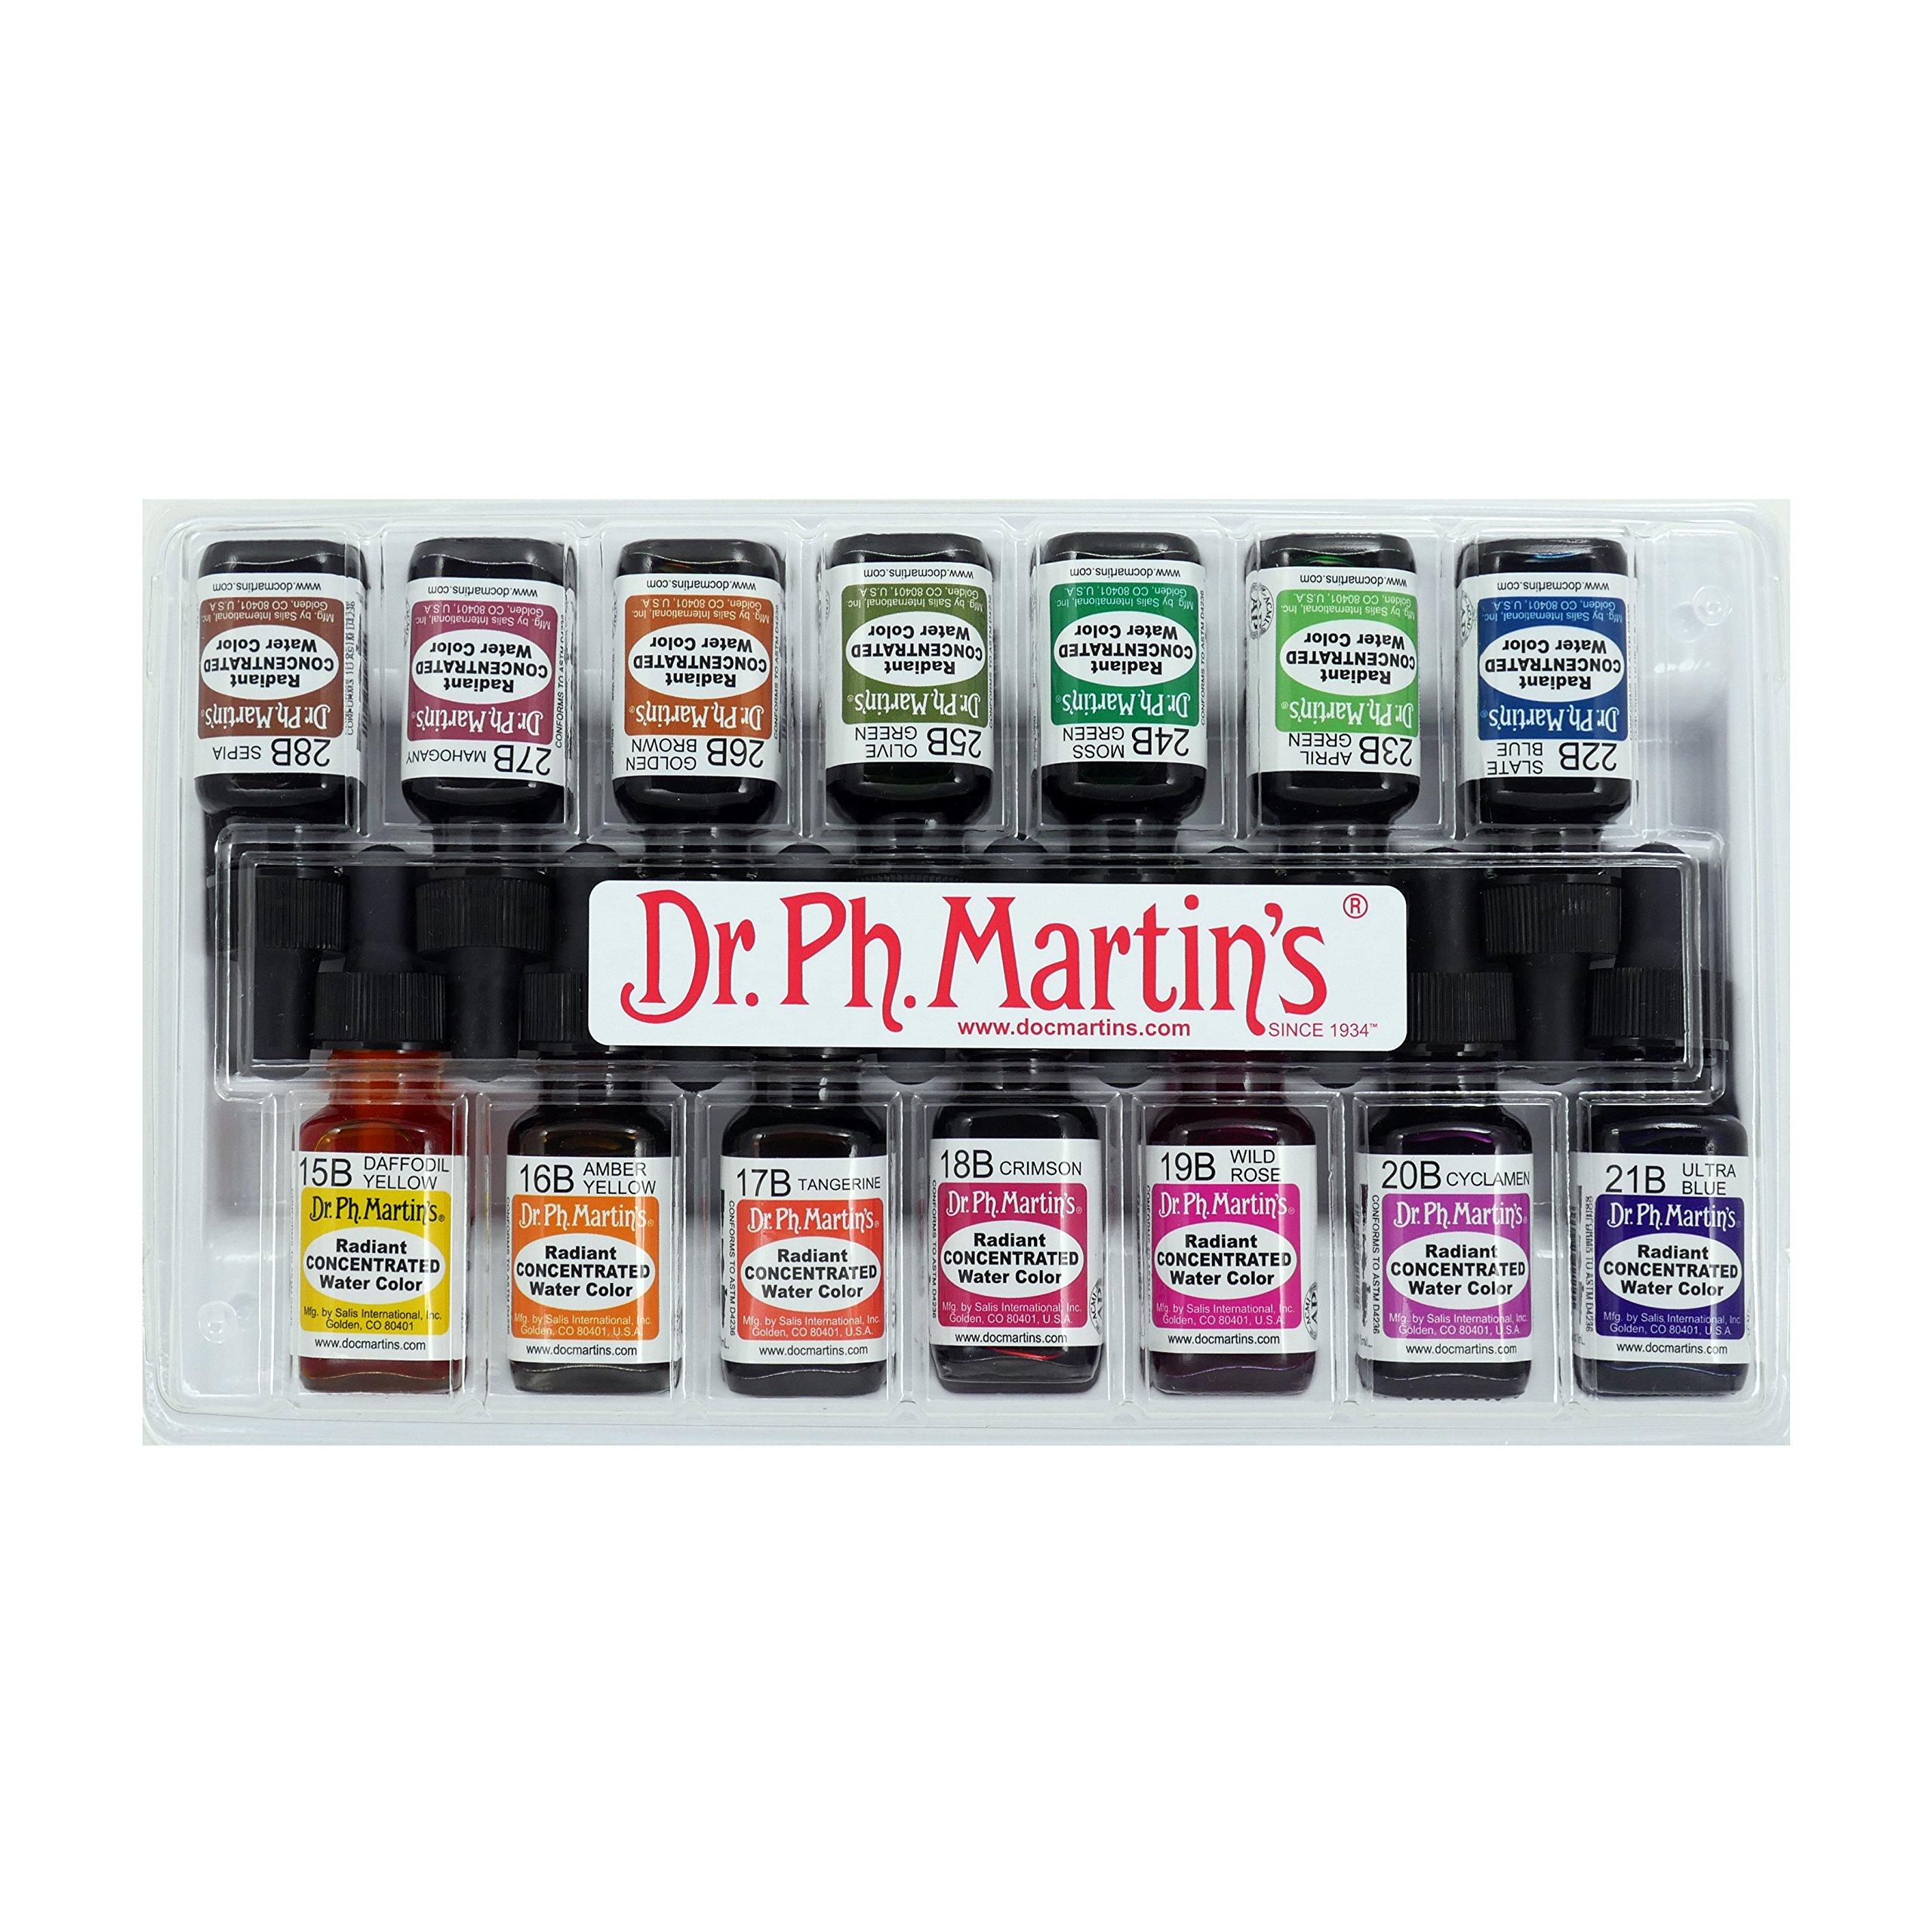 Dr. Ph. Martin's Radiant Concentrated Water Color Bottles, 0.5 oz, Set of 14 (Set B)